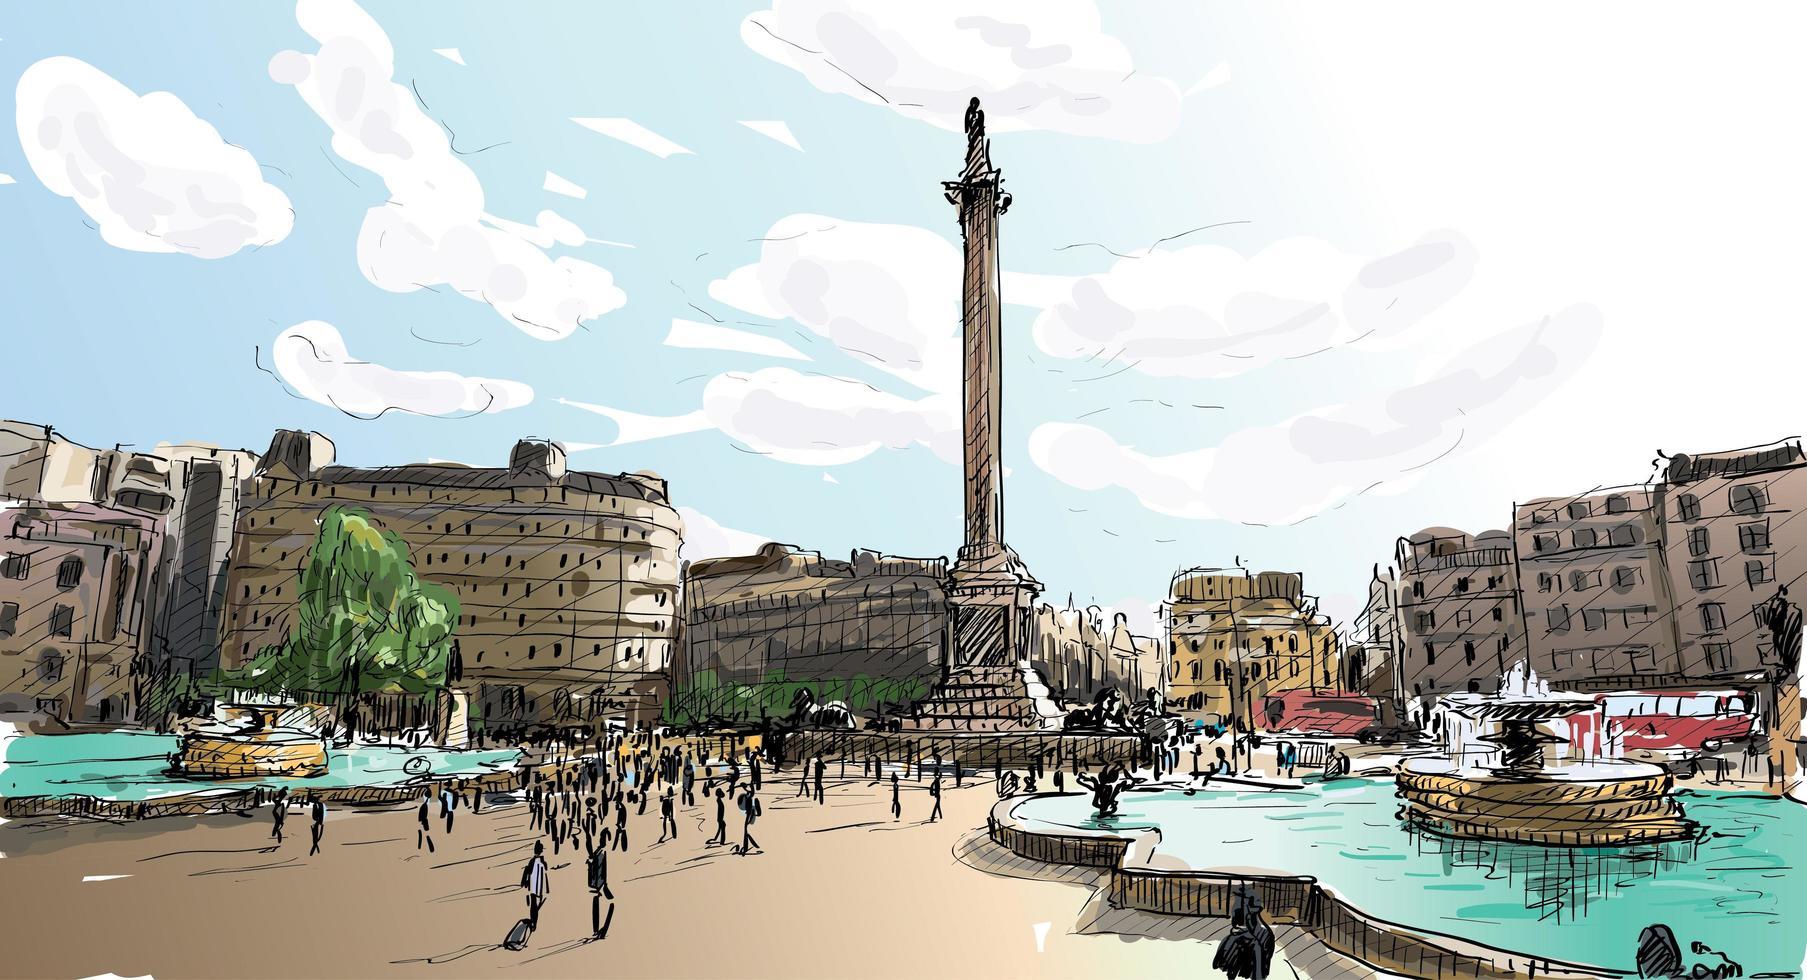 Color sketch of London, England landscape vector